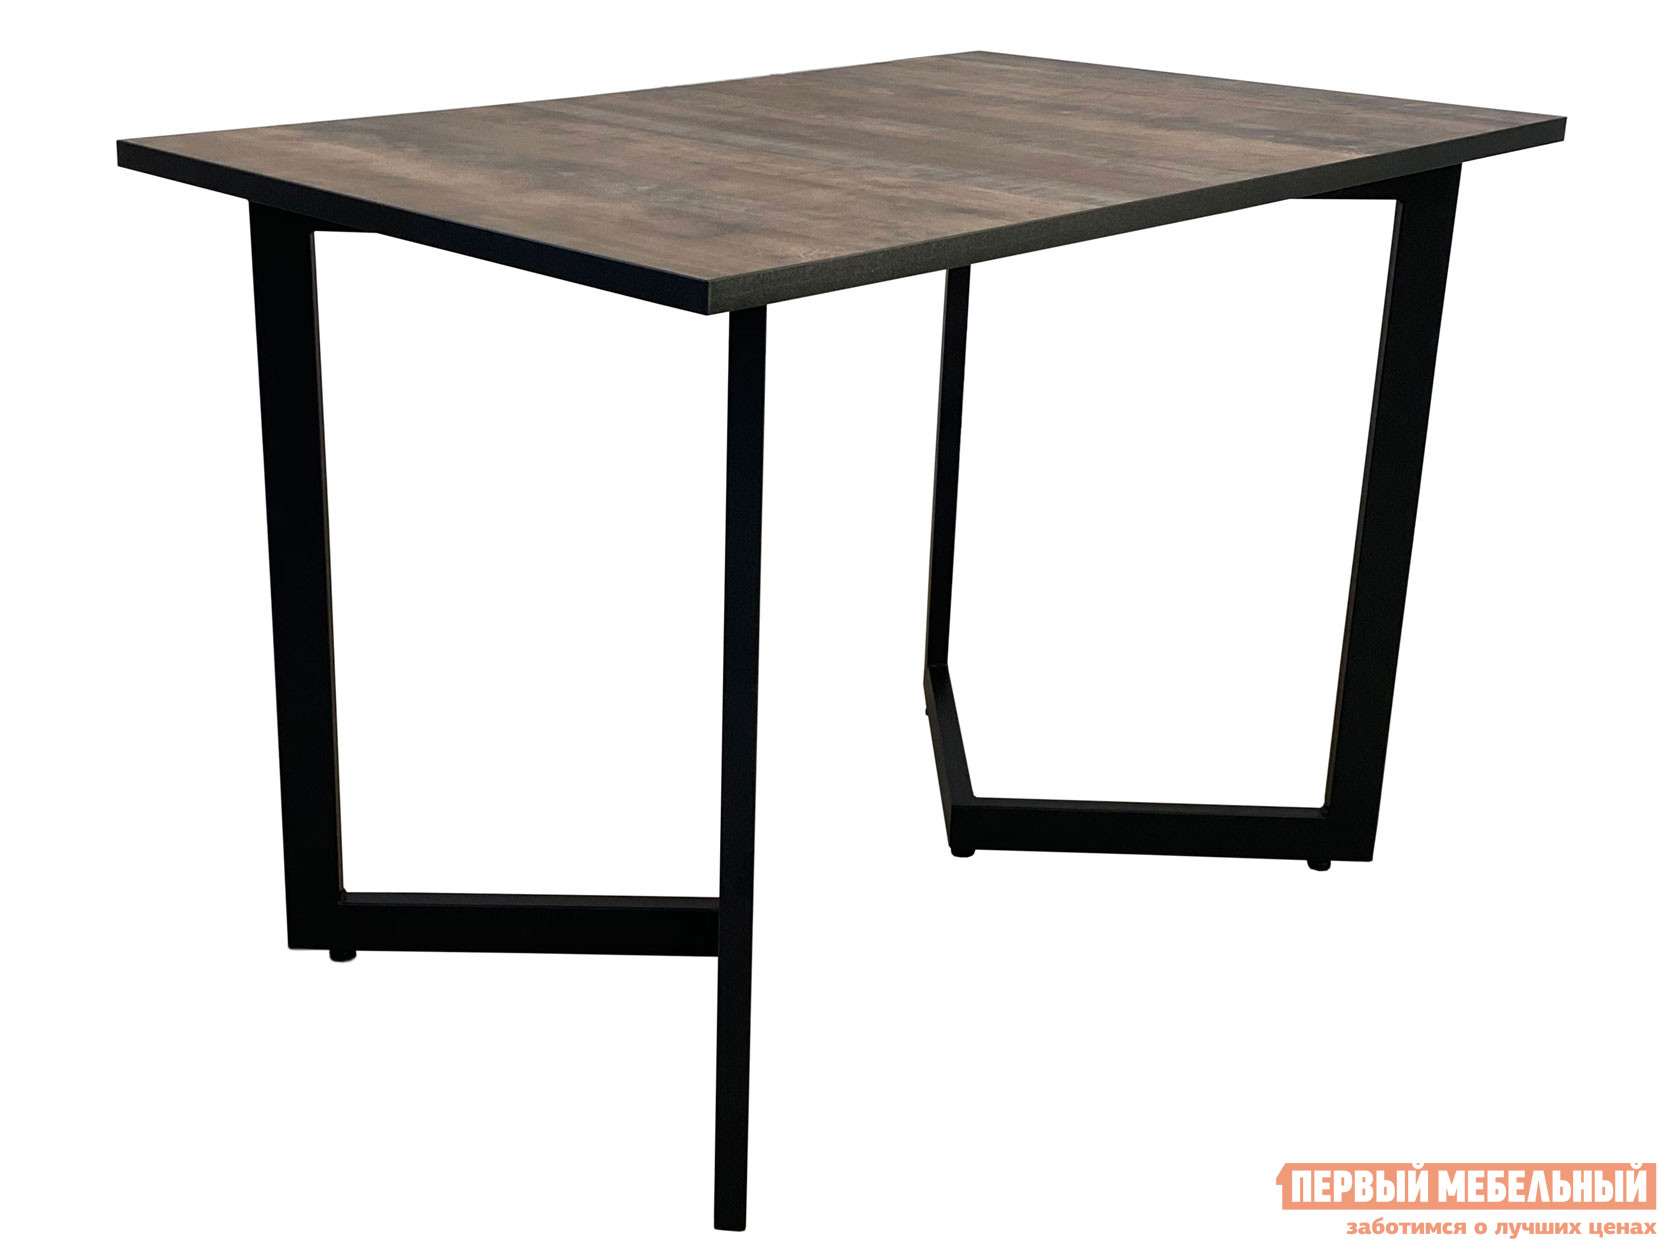 Кухонный стол  Саен 11 Черный, металл / Трансильвания, пластик Мебвилл 119944